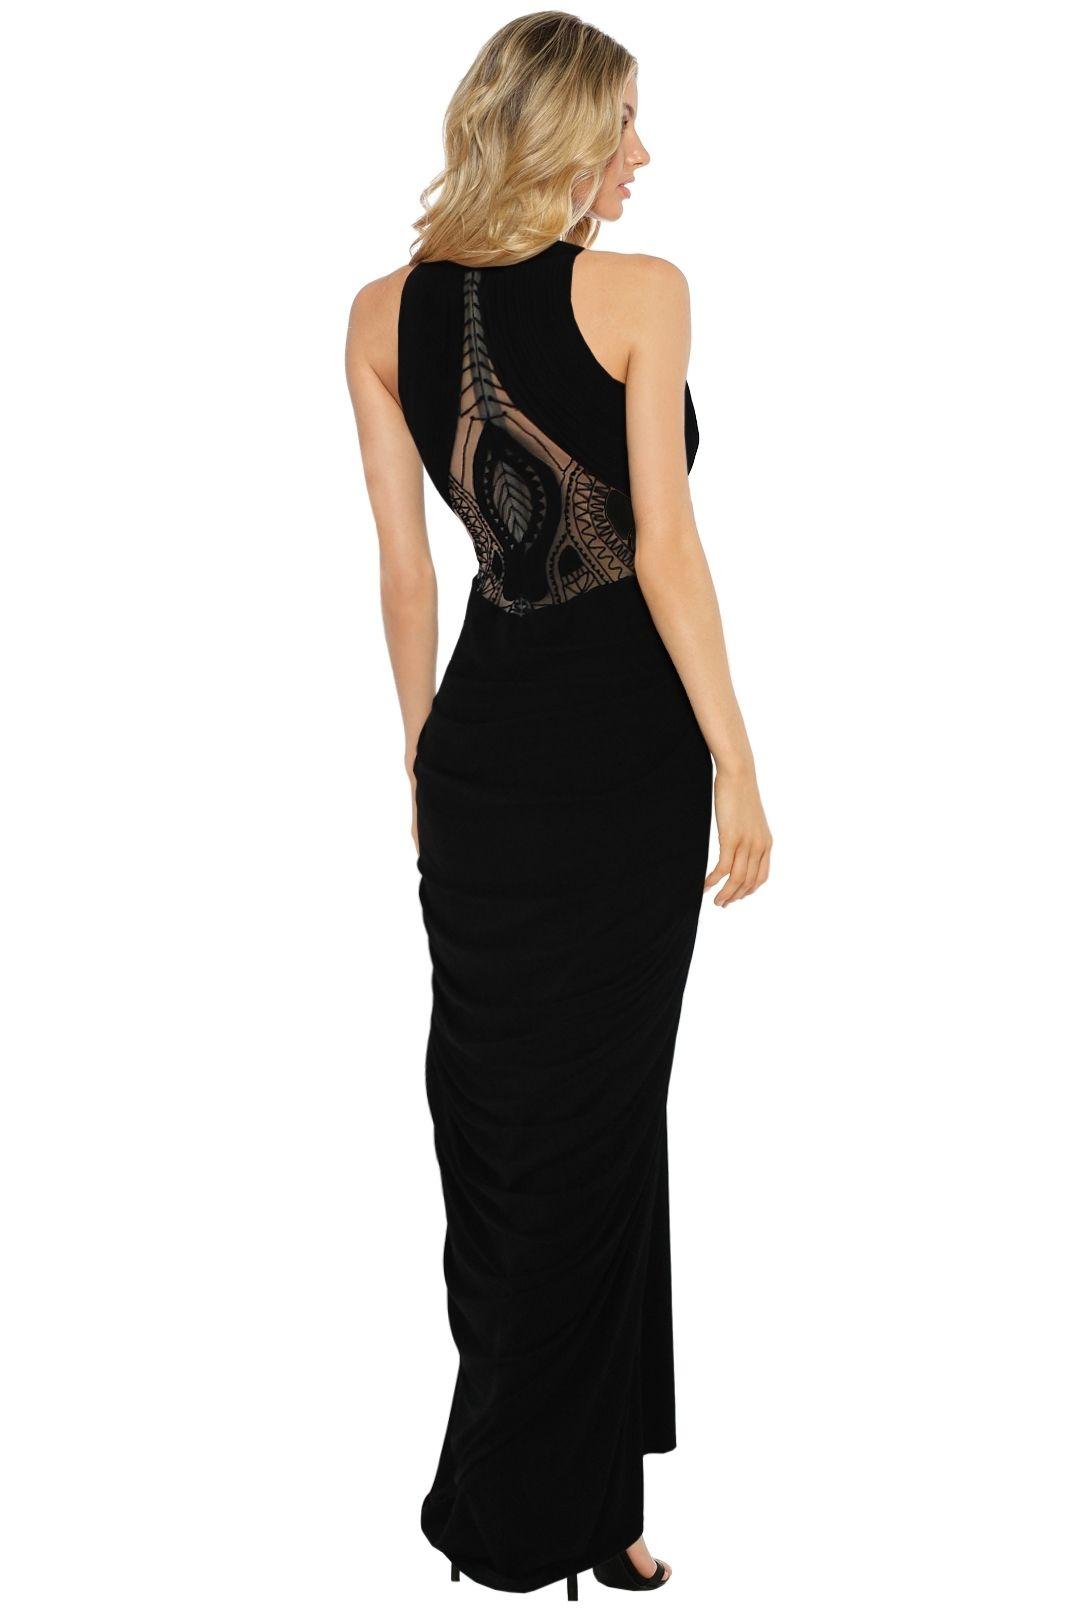 Sheike - Aphrodite Gown - Black - Back